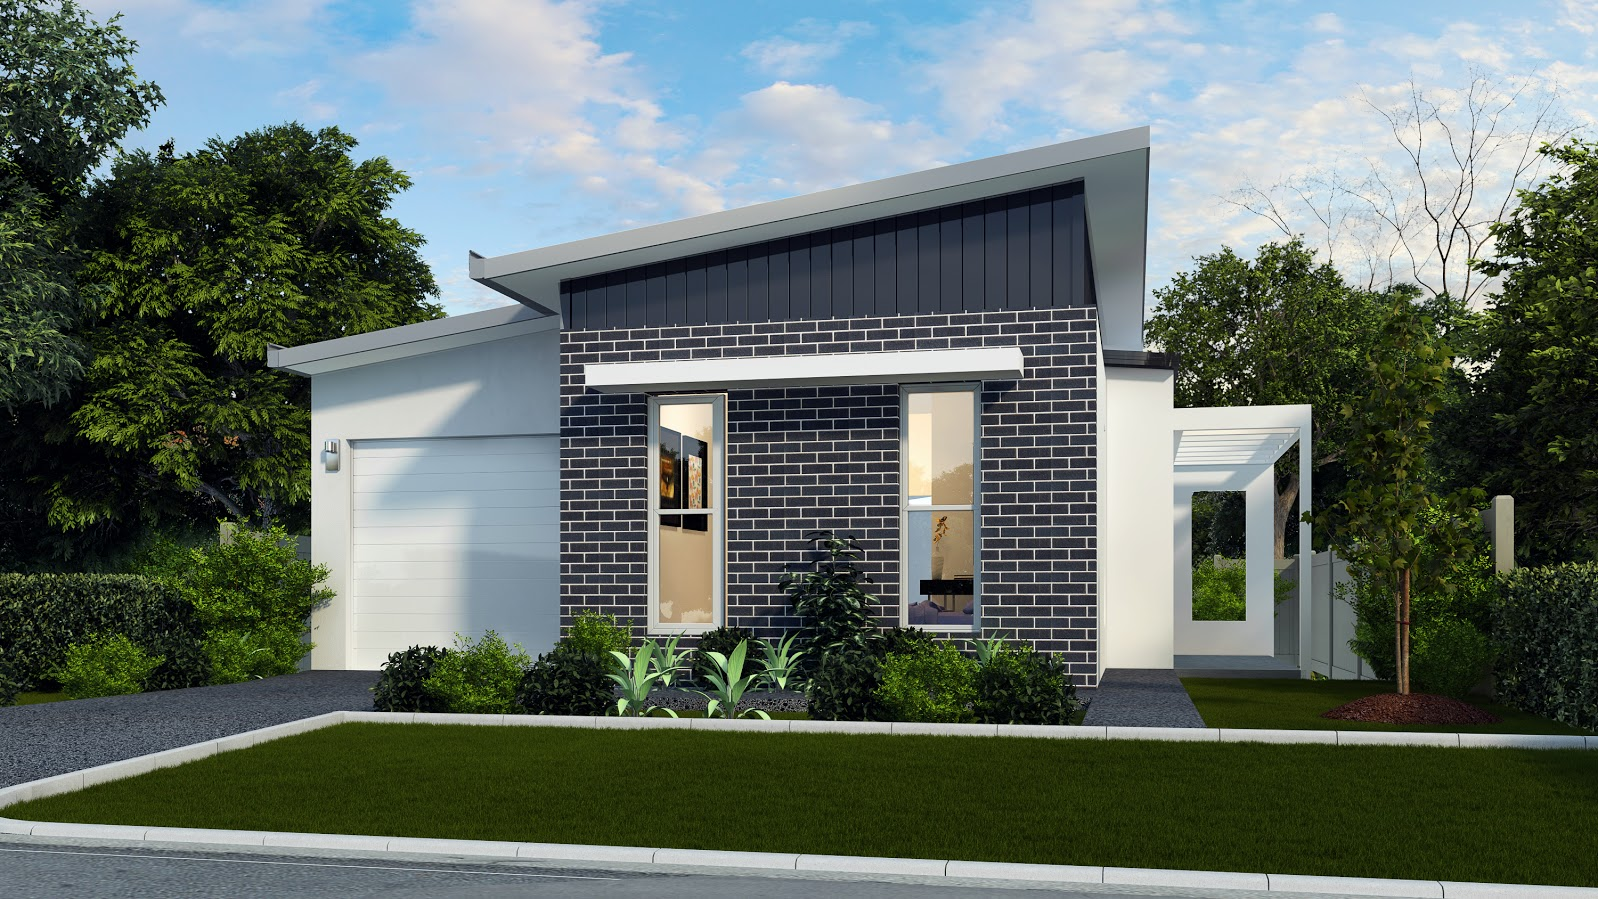 The Abode Alfresco - 3 Bed   2 Bath   2 Car Tandem Garage10m Traditional Lots